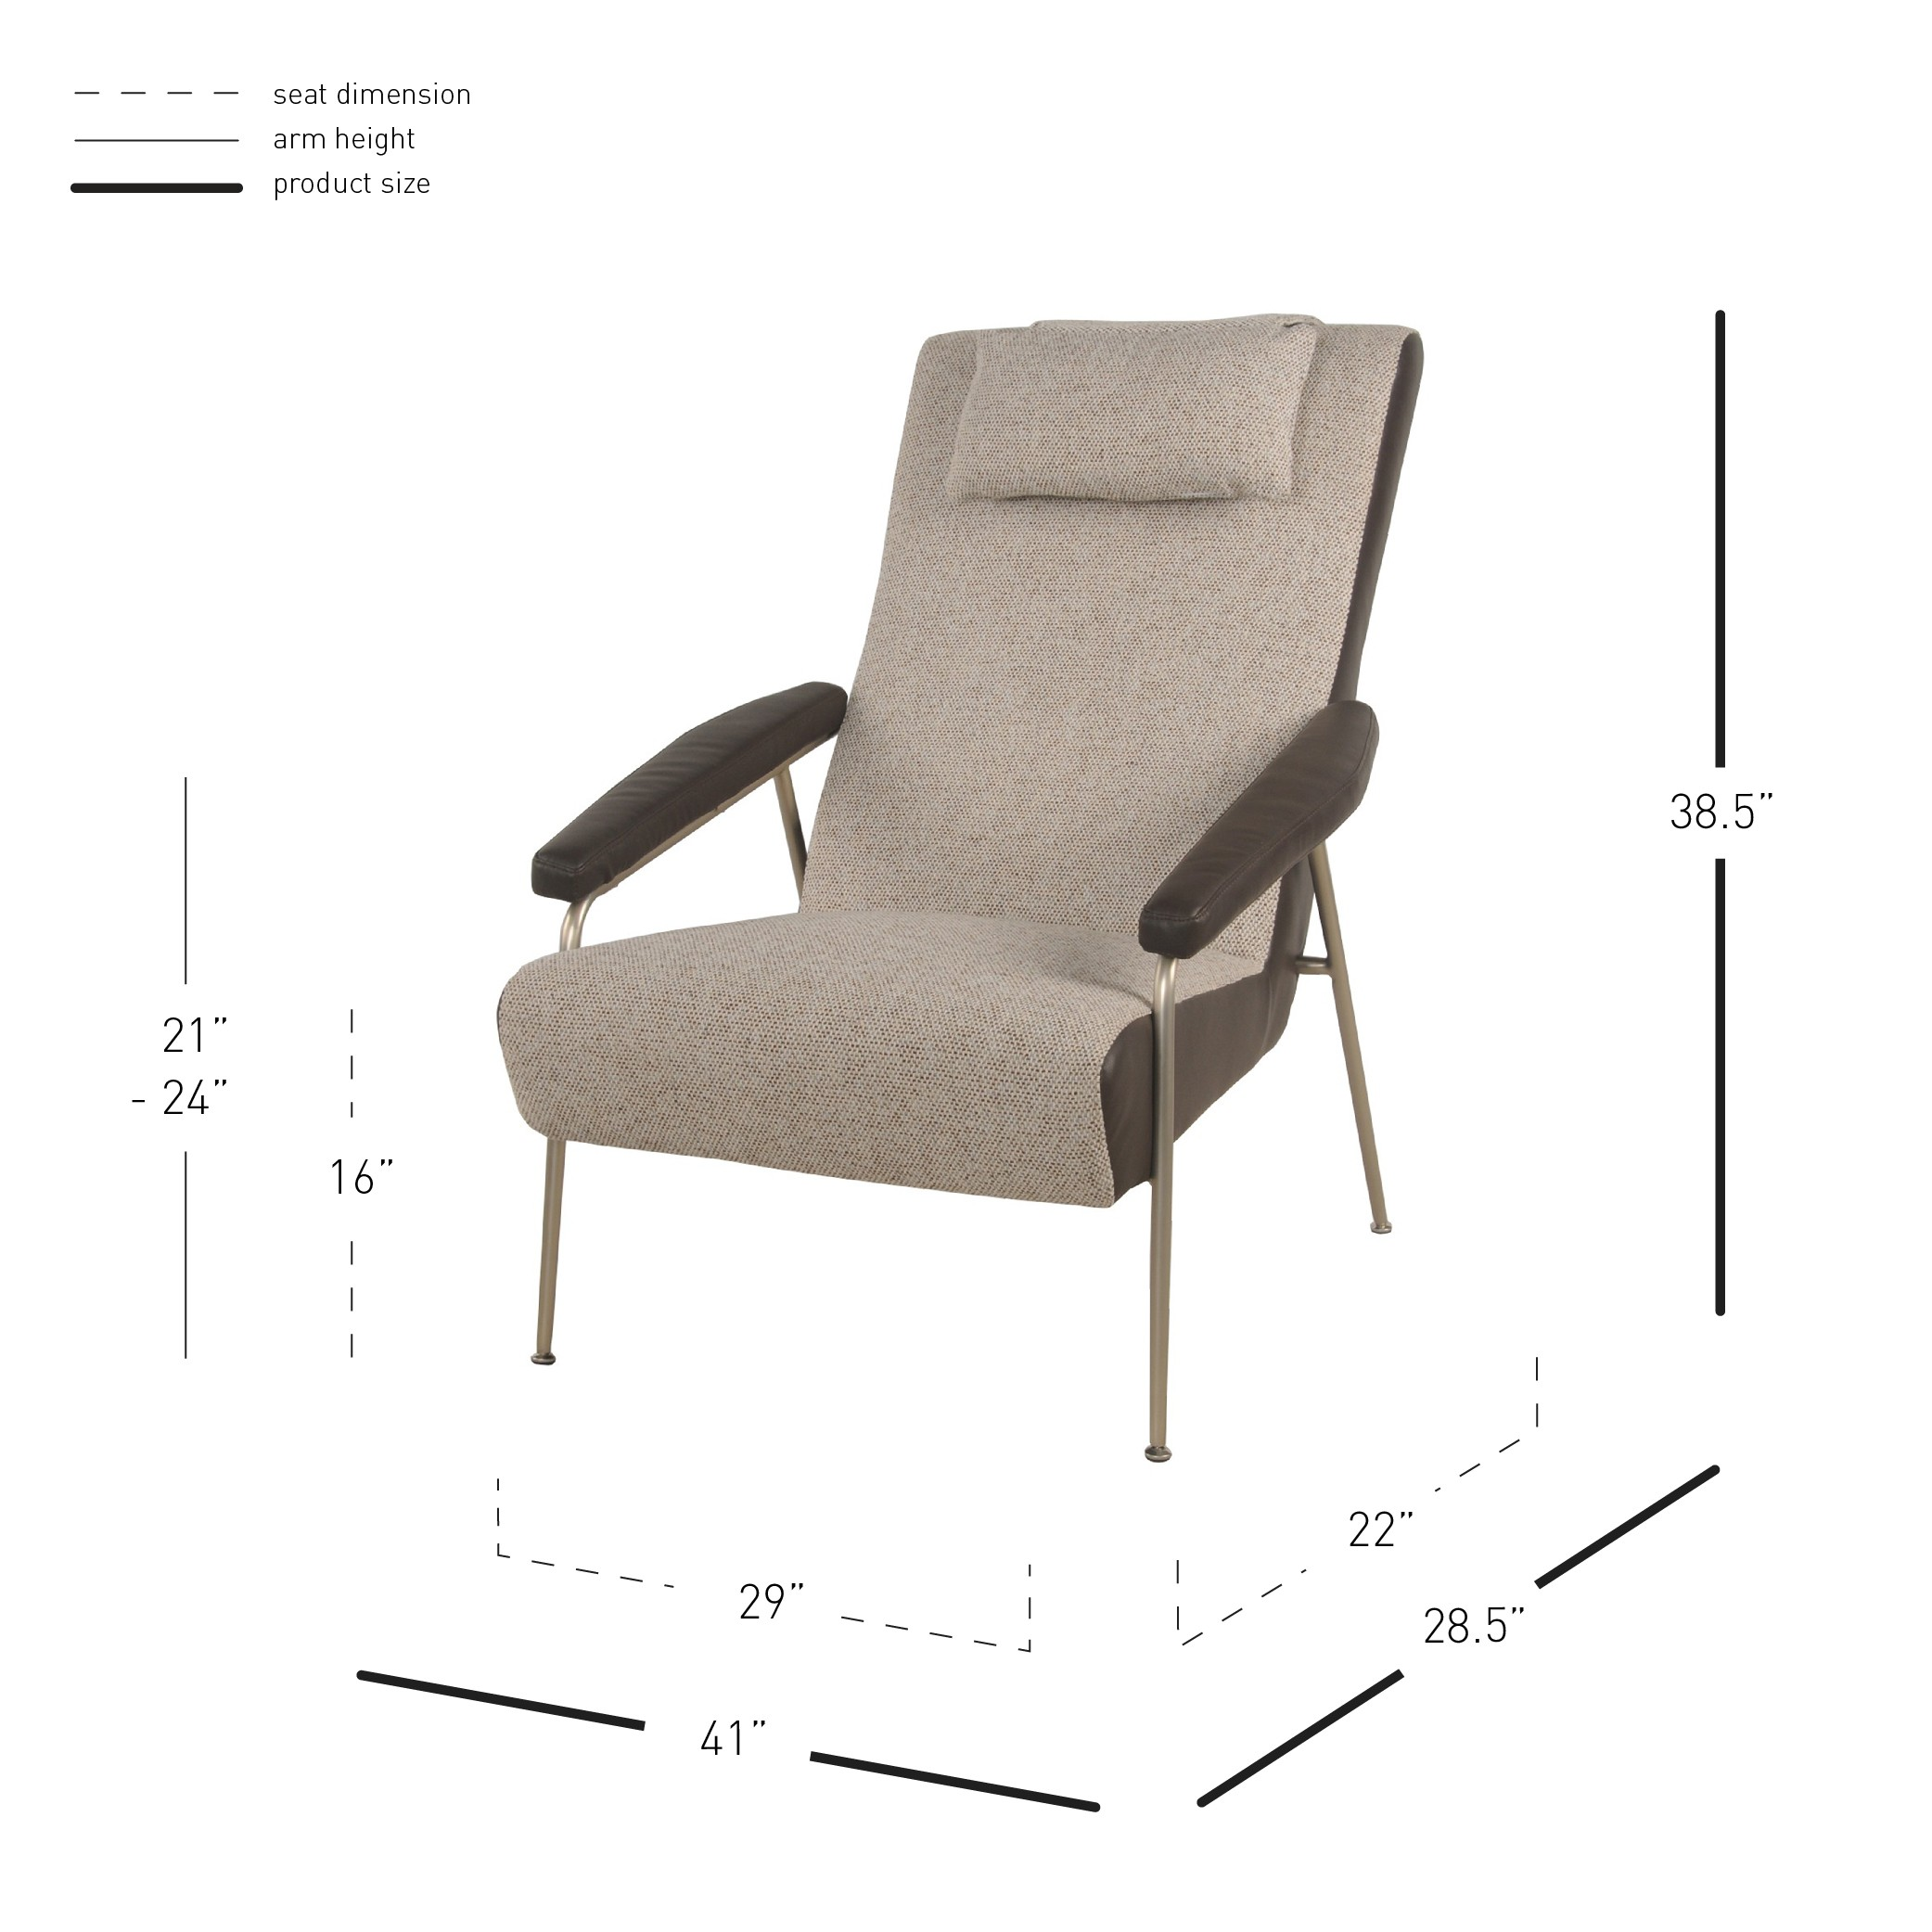 zephyr desk chair office mat for hardwood floors 6700016 npd furniture wholesale lifestyle